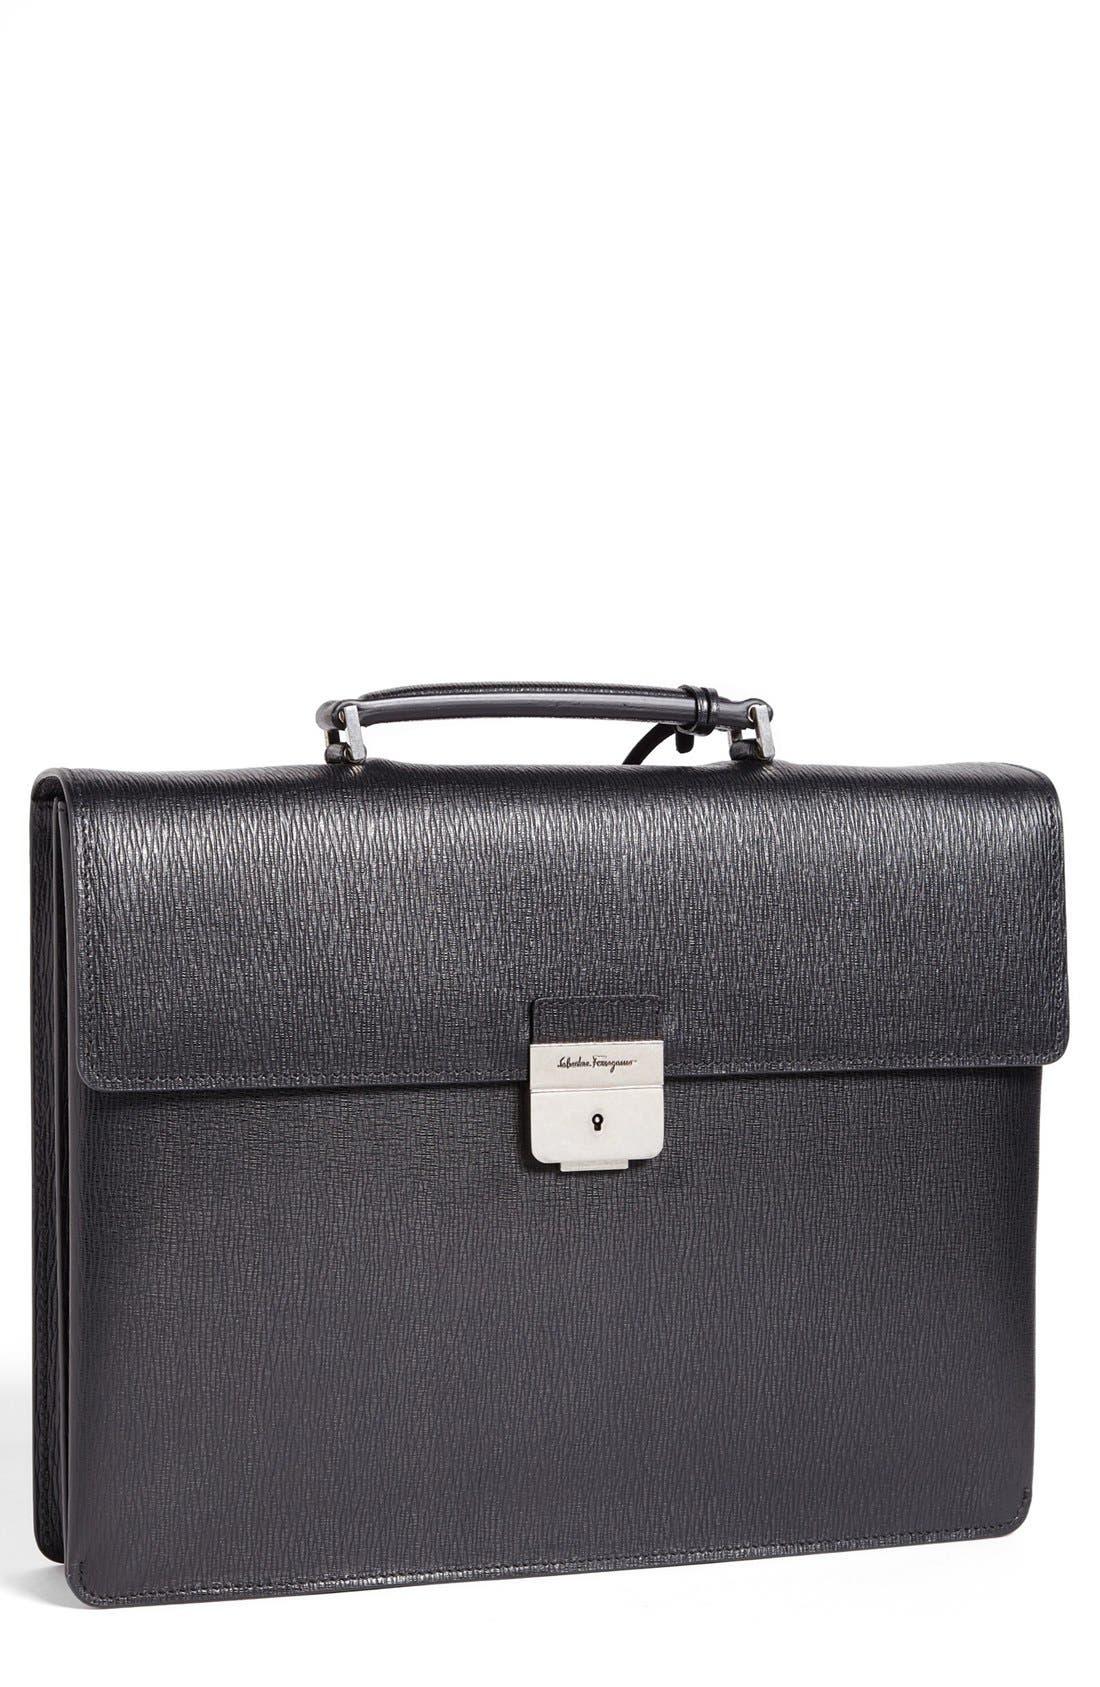 Main Image - Salvatore Ferragamo 'Revival' Briefcase